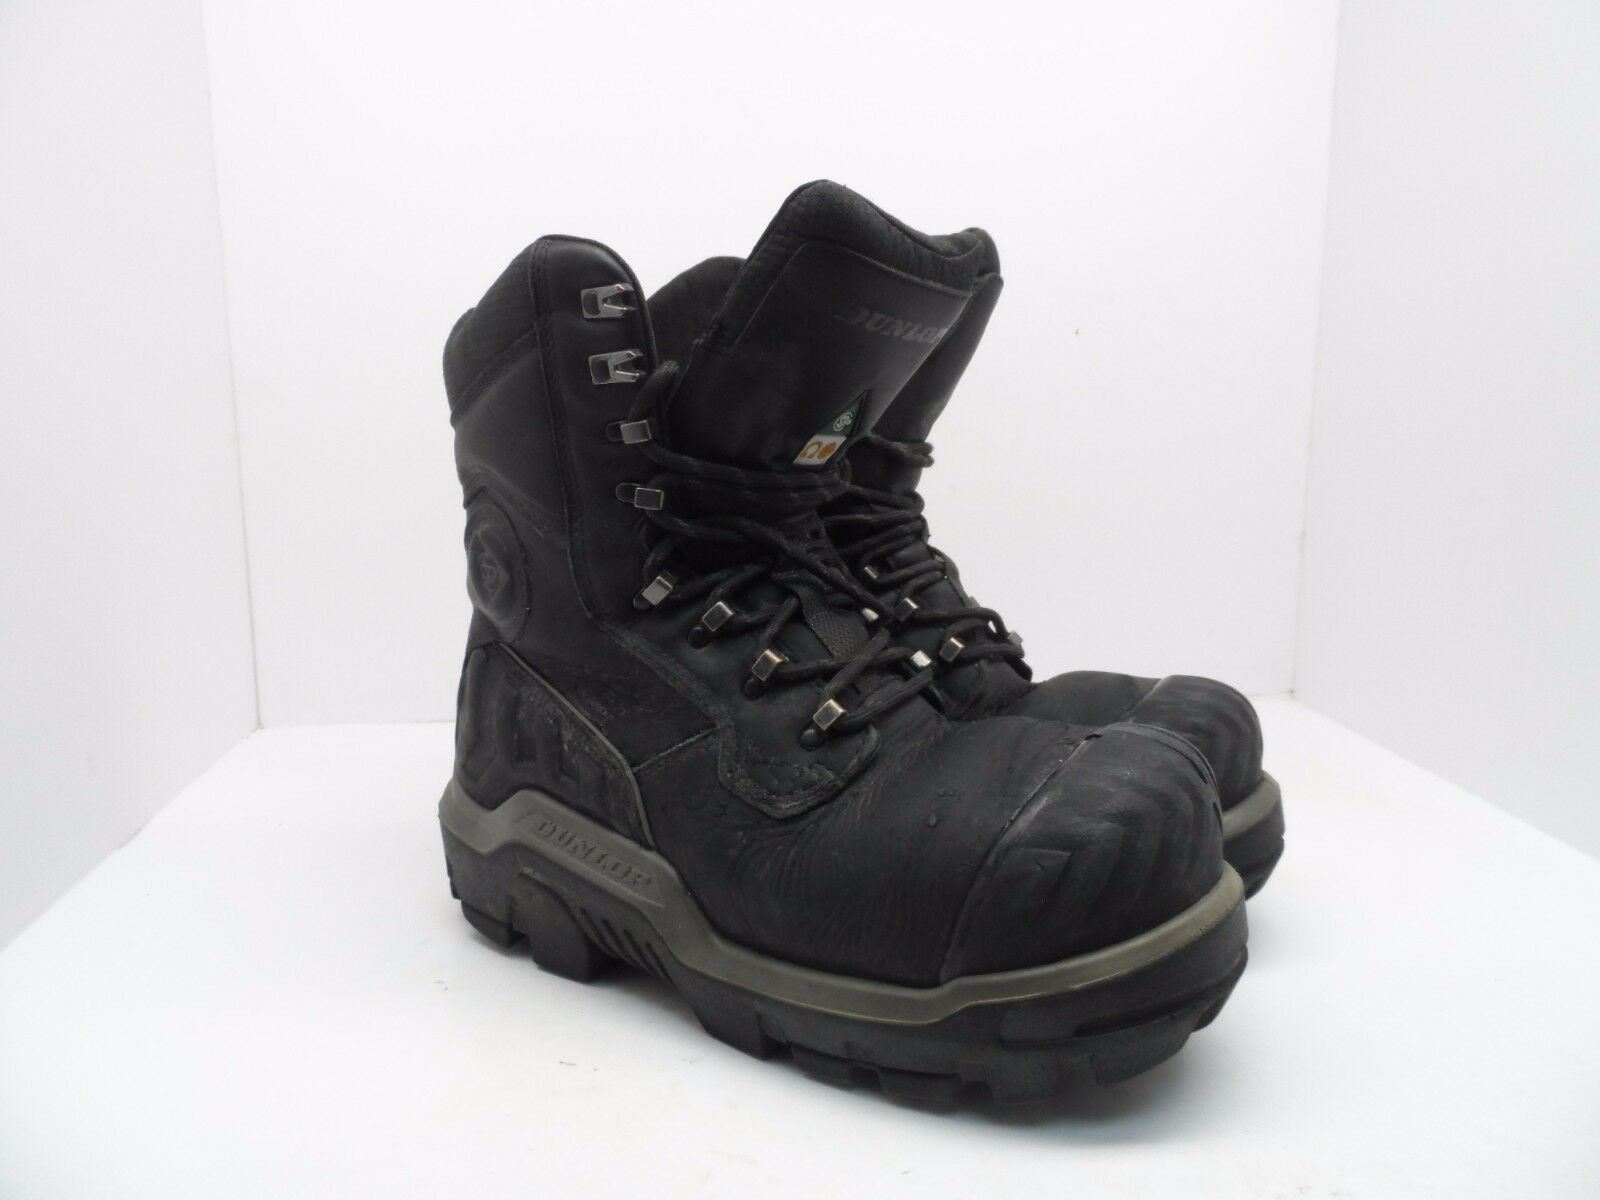 Dunlop Men's 8'' Composite Toe Composite Plate WP Leather Work Boots Black 9M